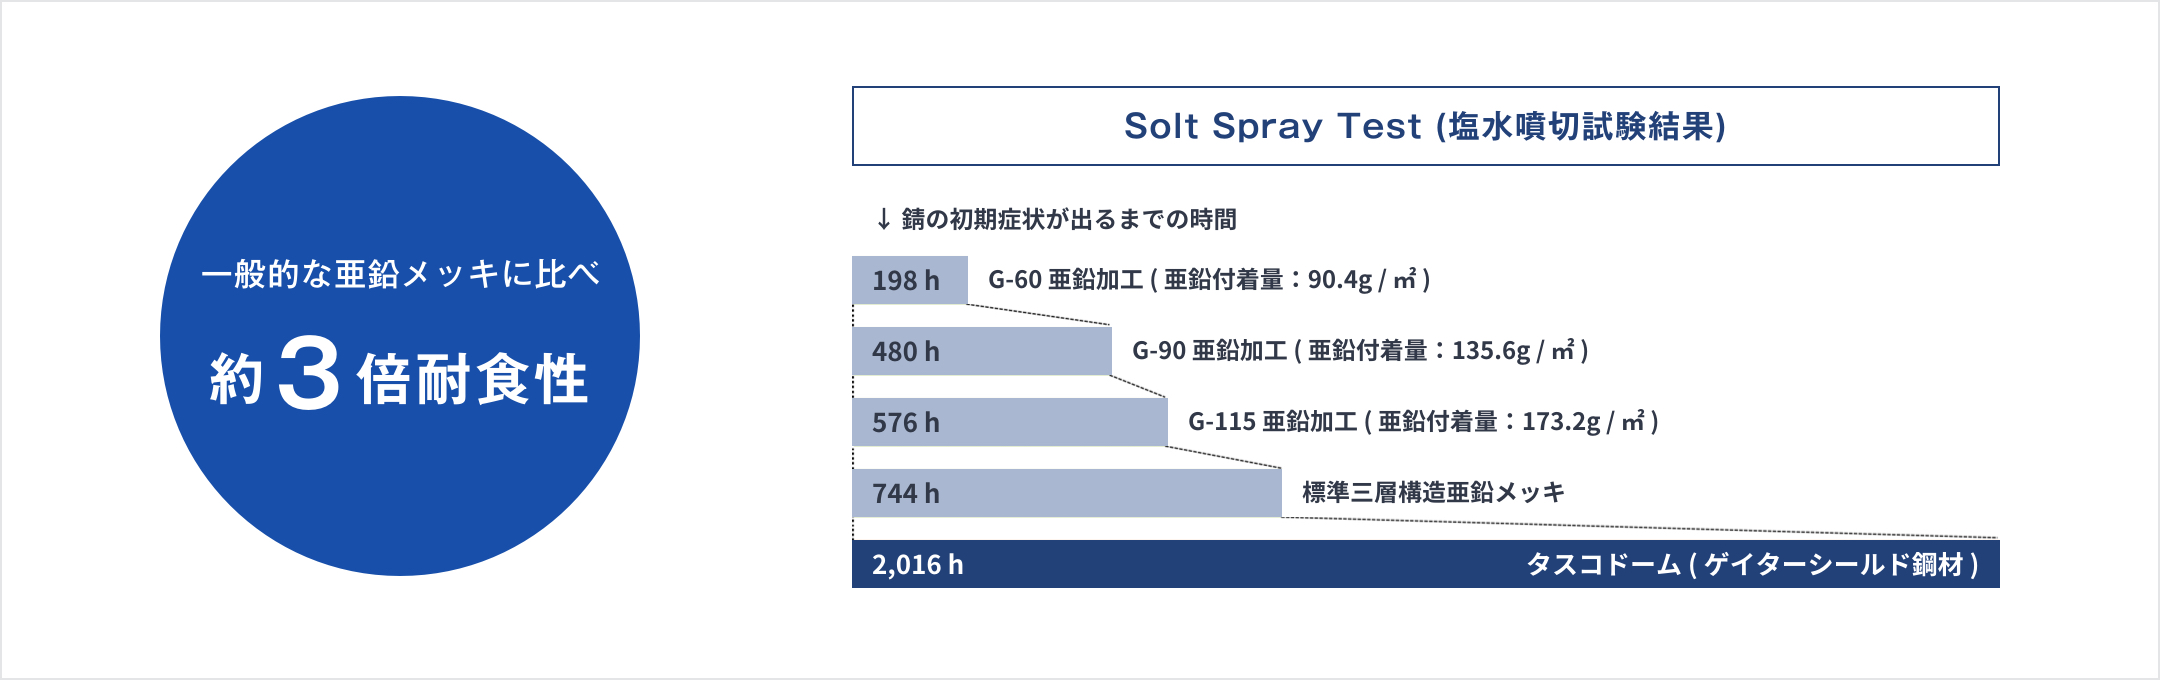 Solt Spray Test(塩水噴切試験結果)イメージ